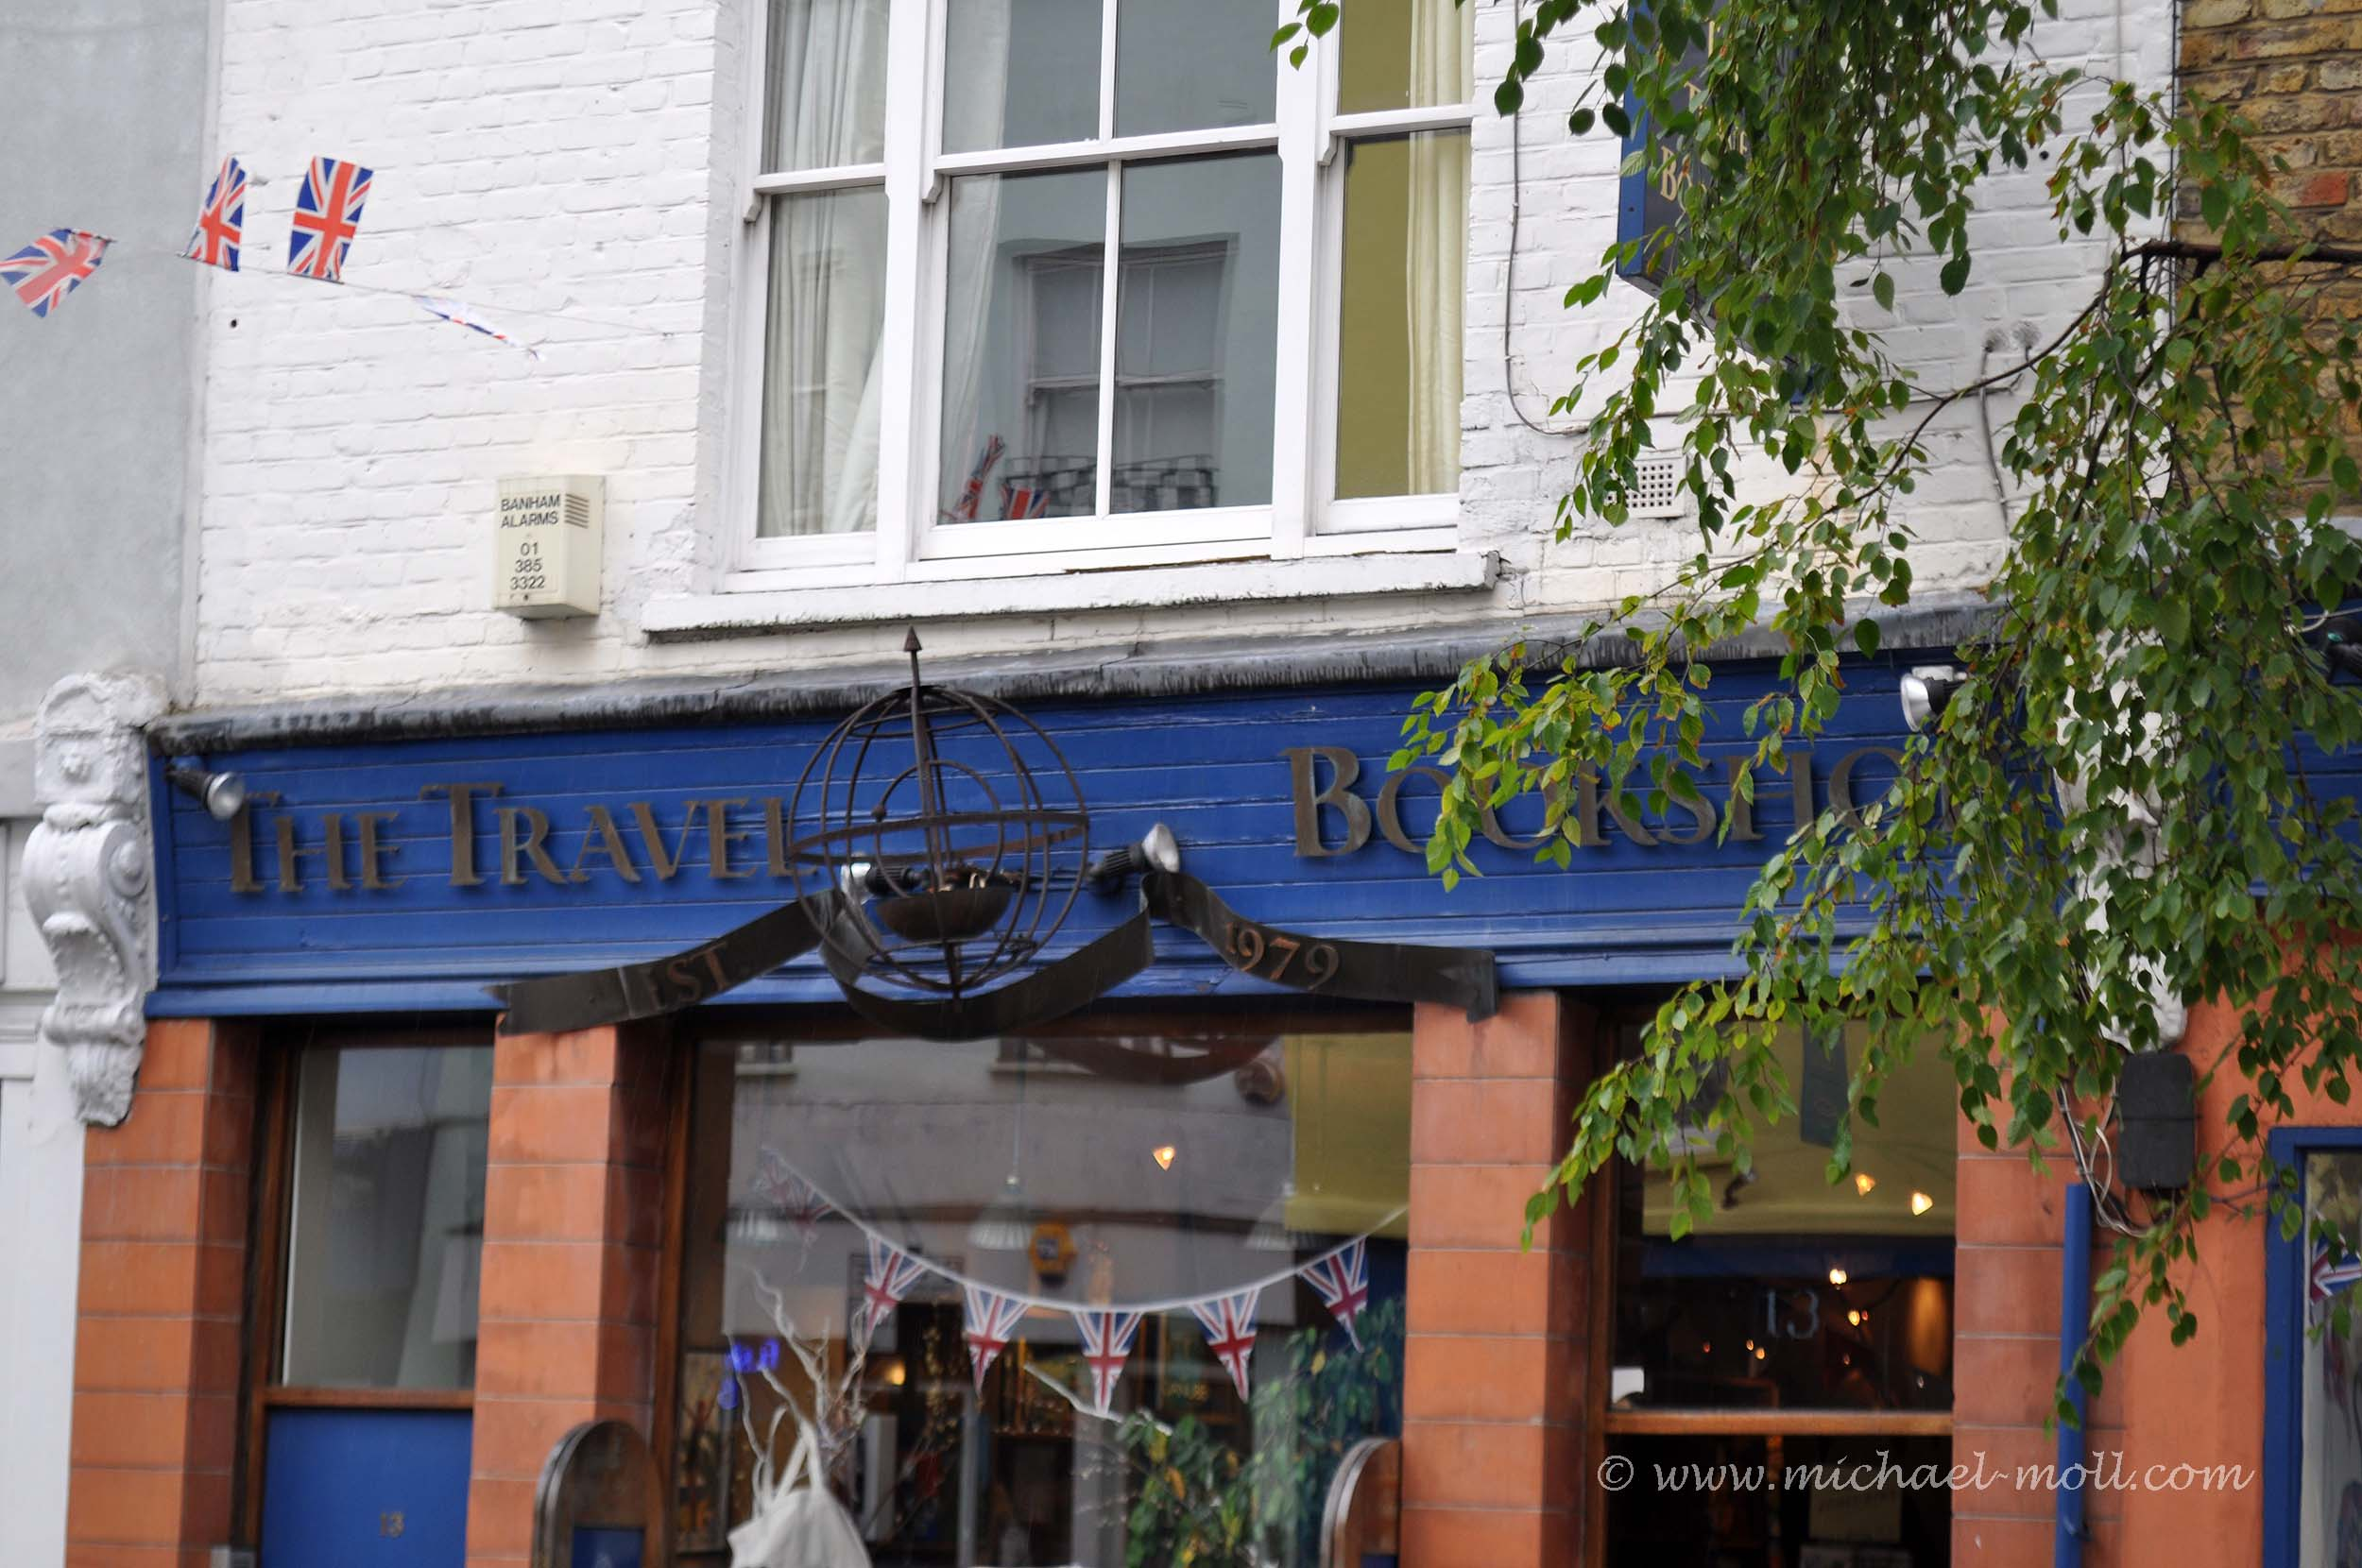 Der berühmte Travelbook Shop